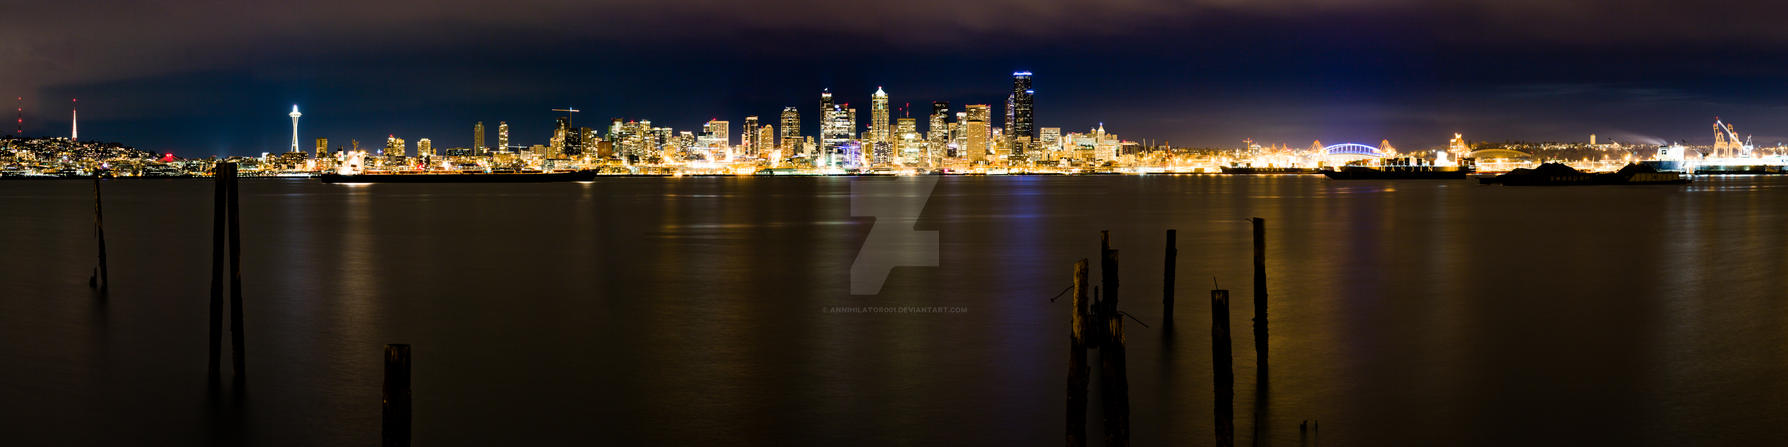 Seattle View 3 by ANNIHILATOR001